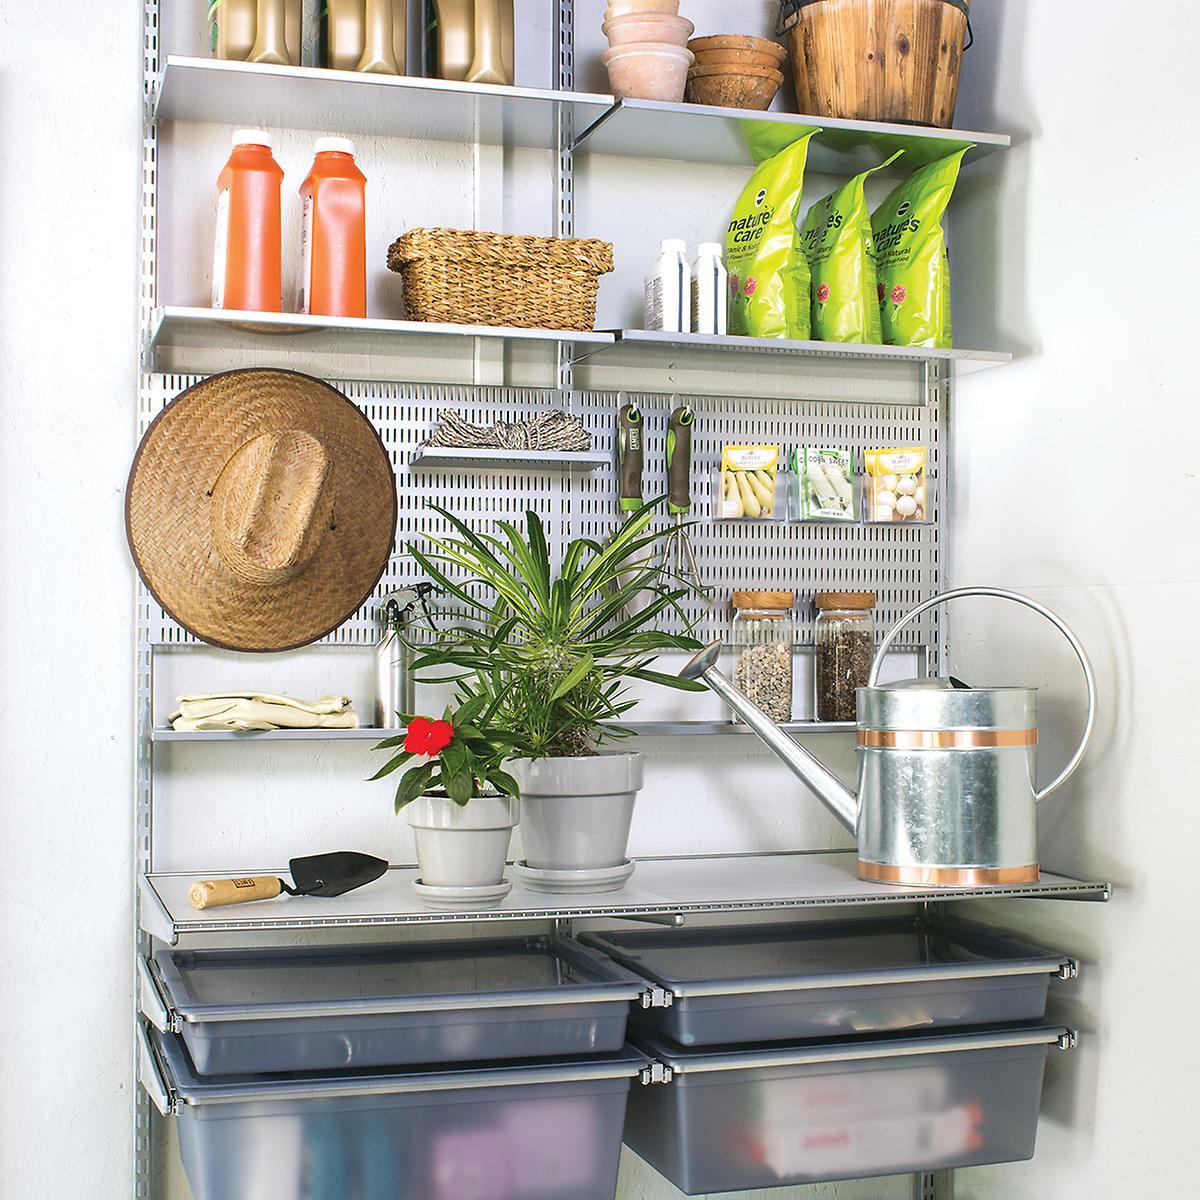 Elfa Custom Shelving and drawers